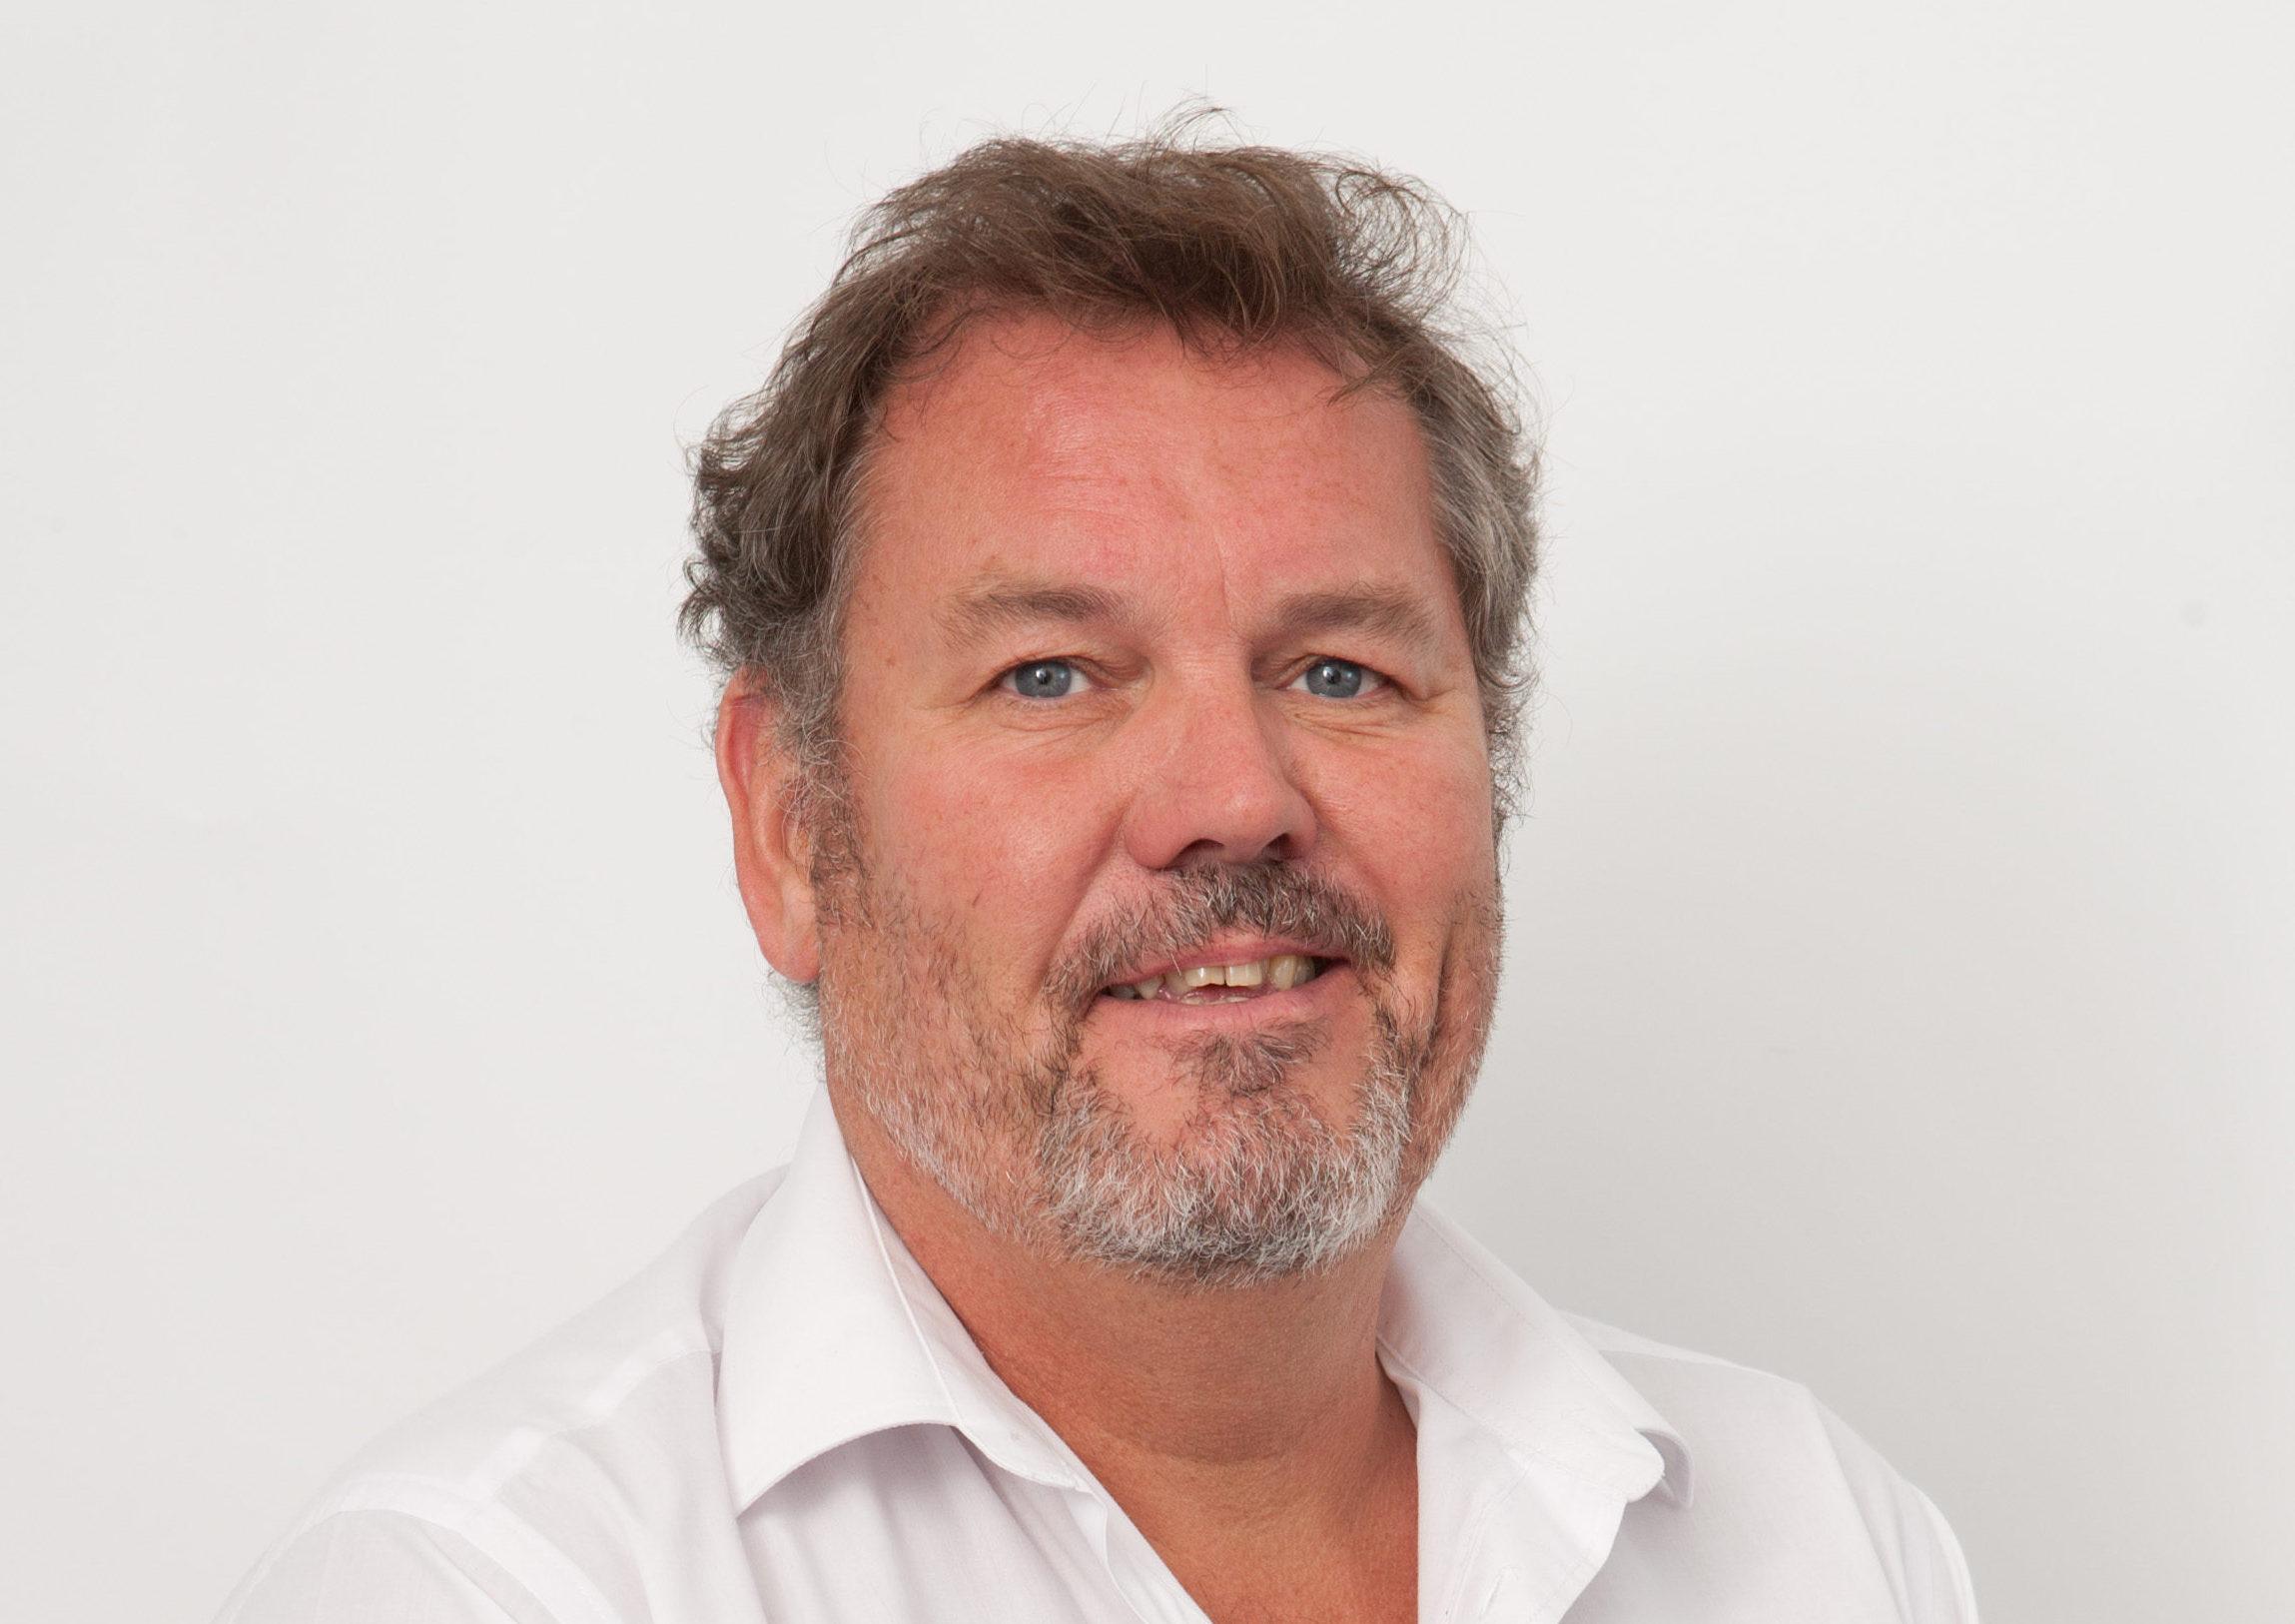 Fairway Foodservice Chief Executive Chris Binge